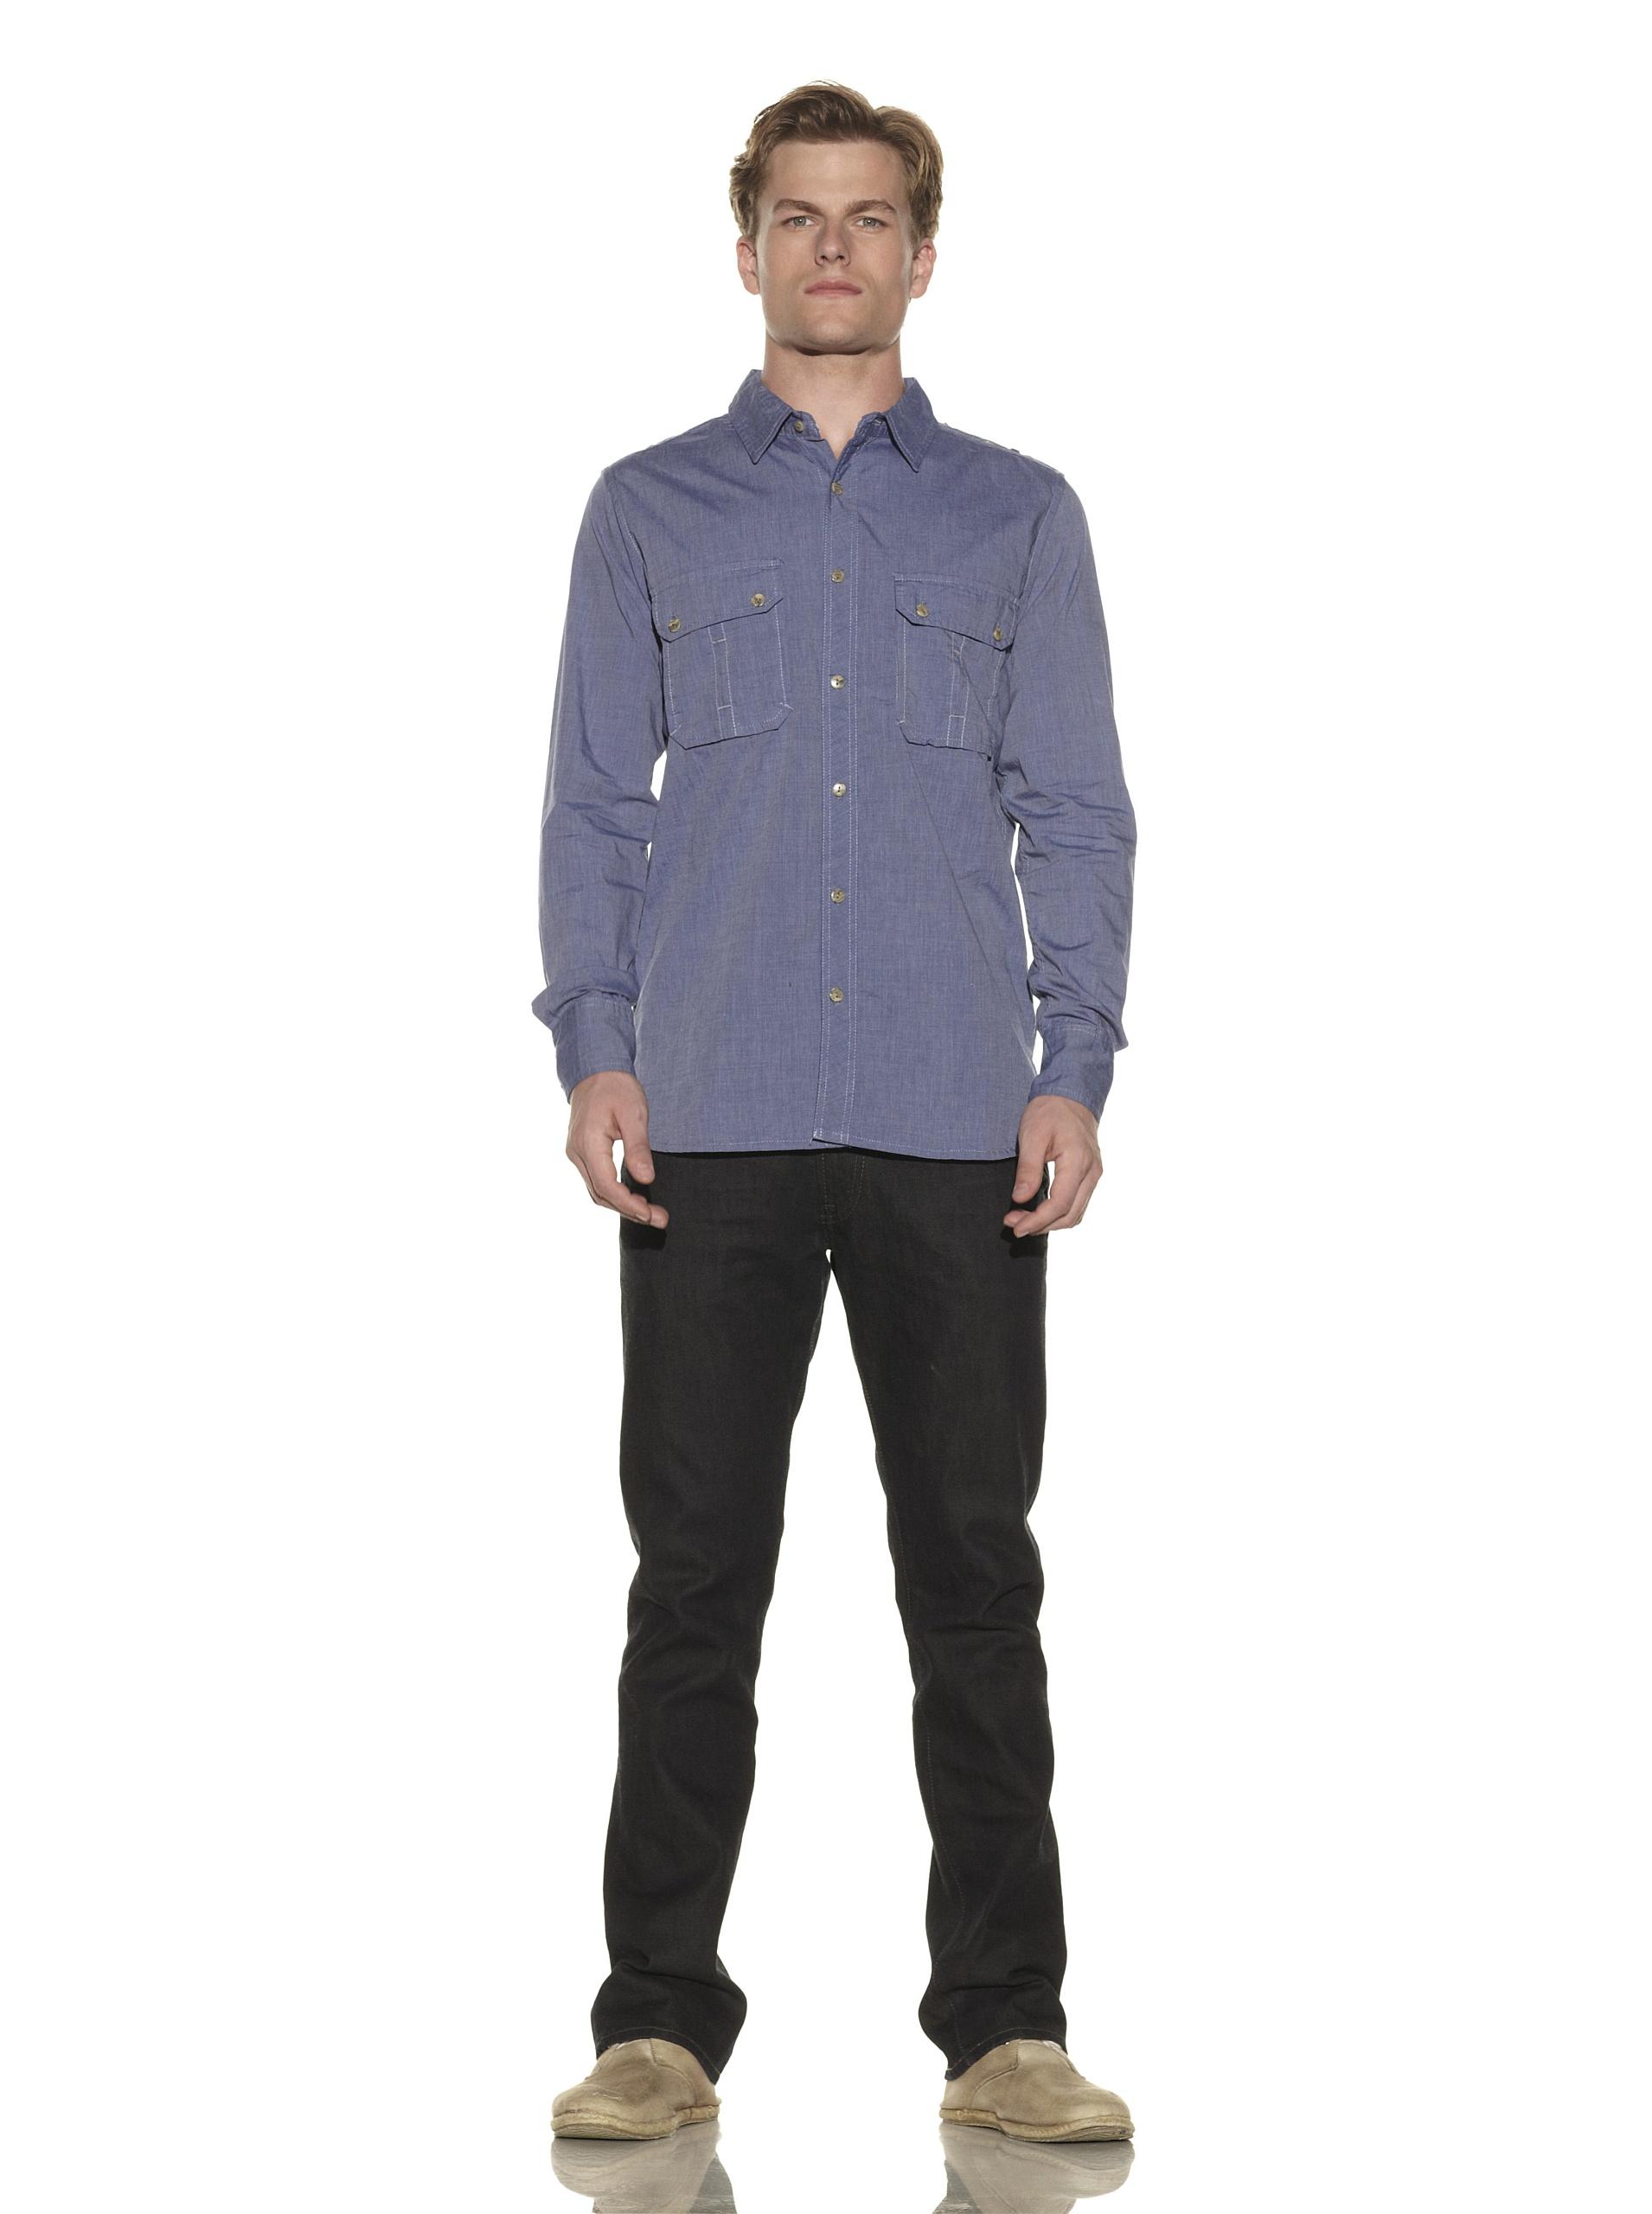 nüco Men's Long Sleeve Woven Chambray Shirt (Royal)